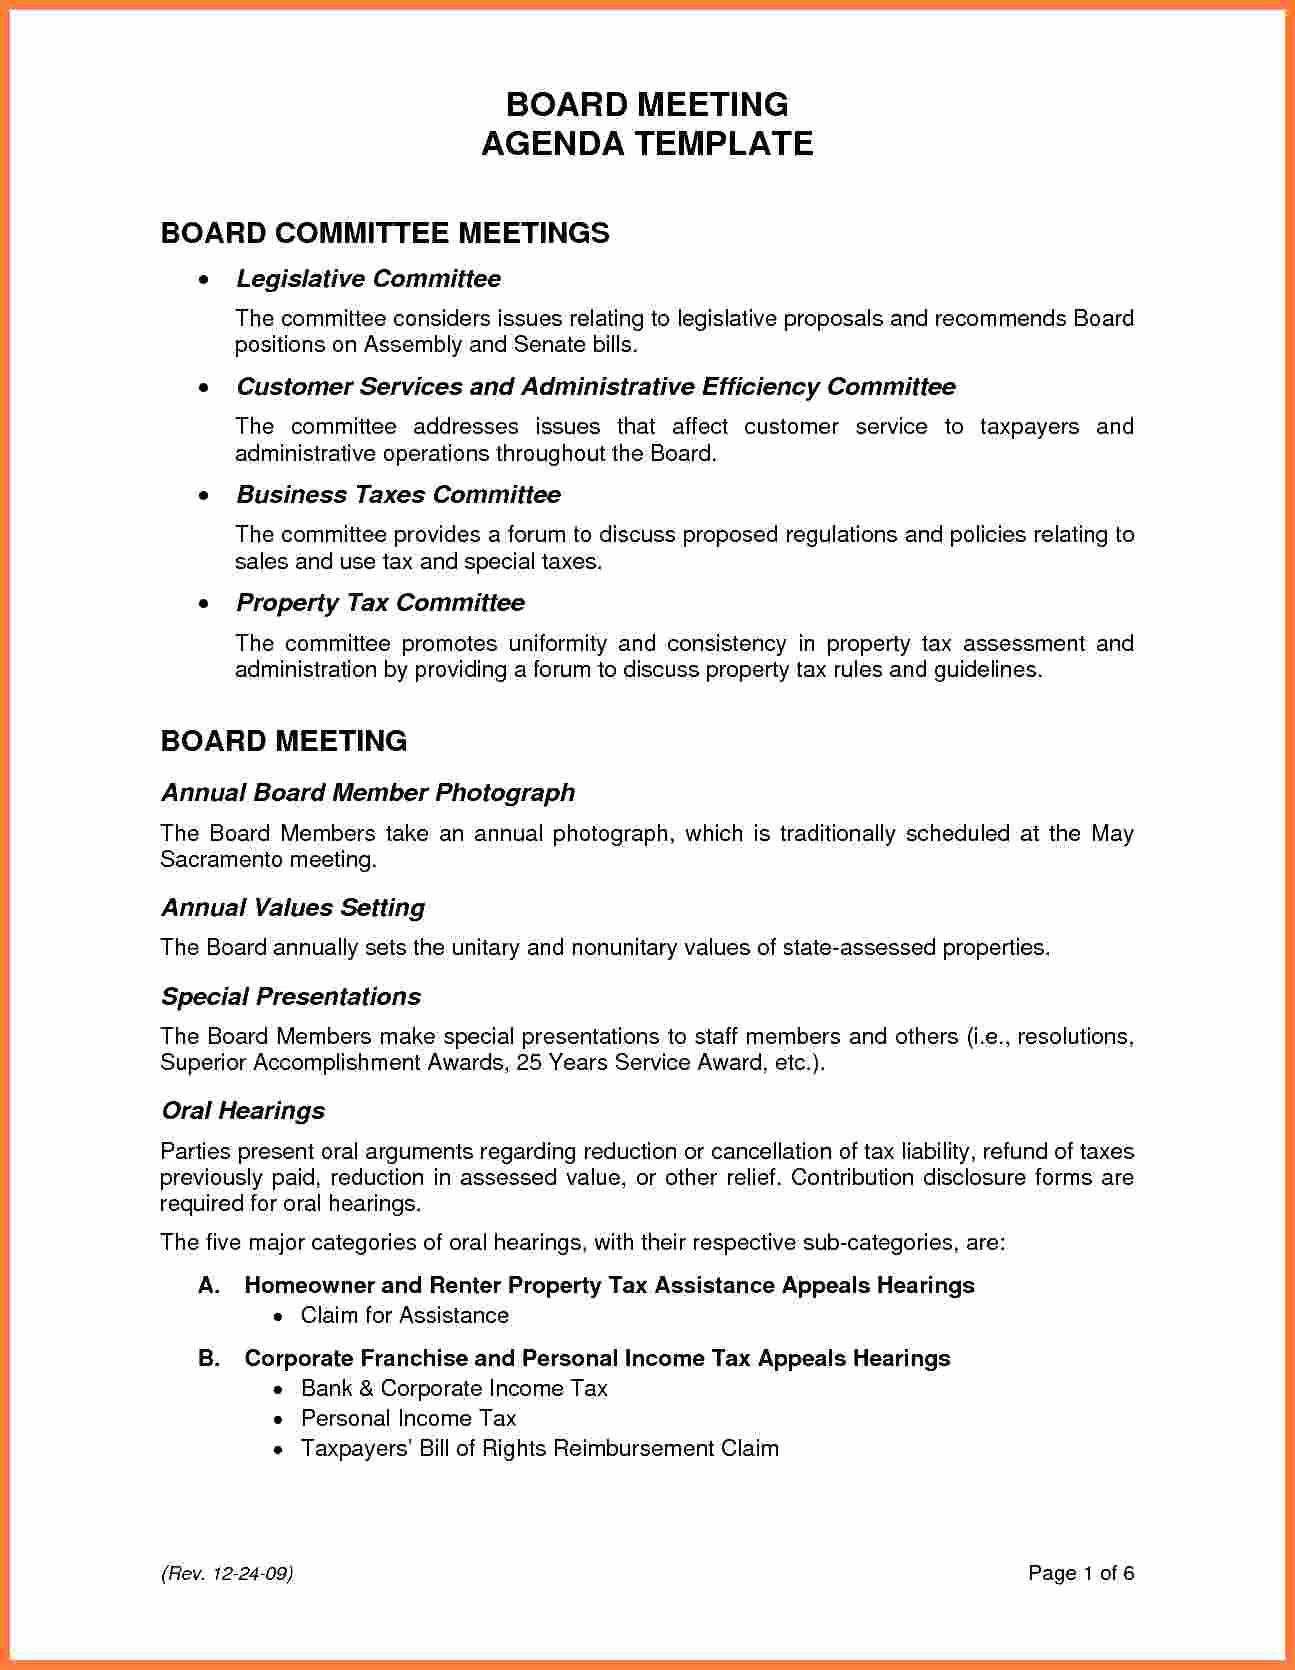 Board Meeting Agenda Template Inspirational 5 Board Meeting Agenda